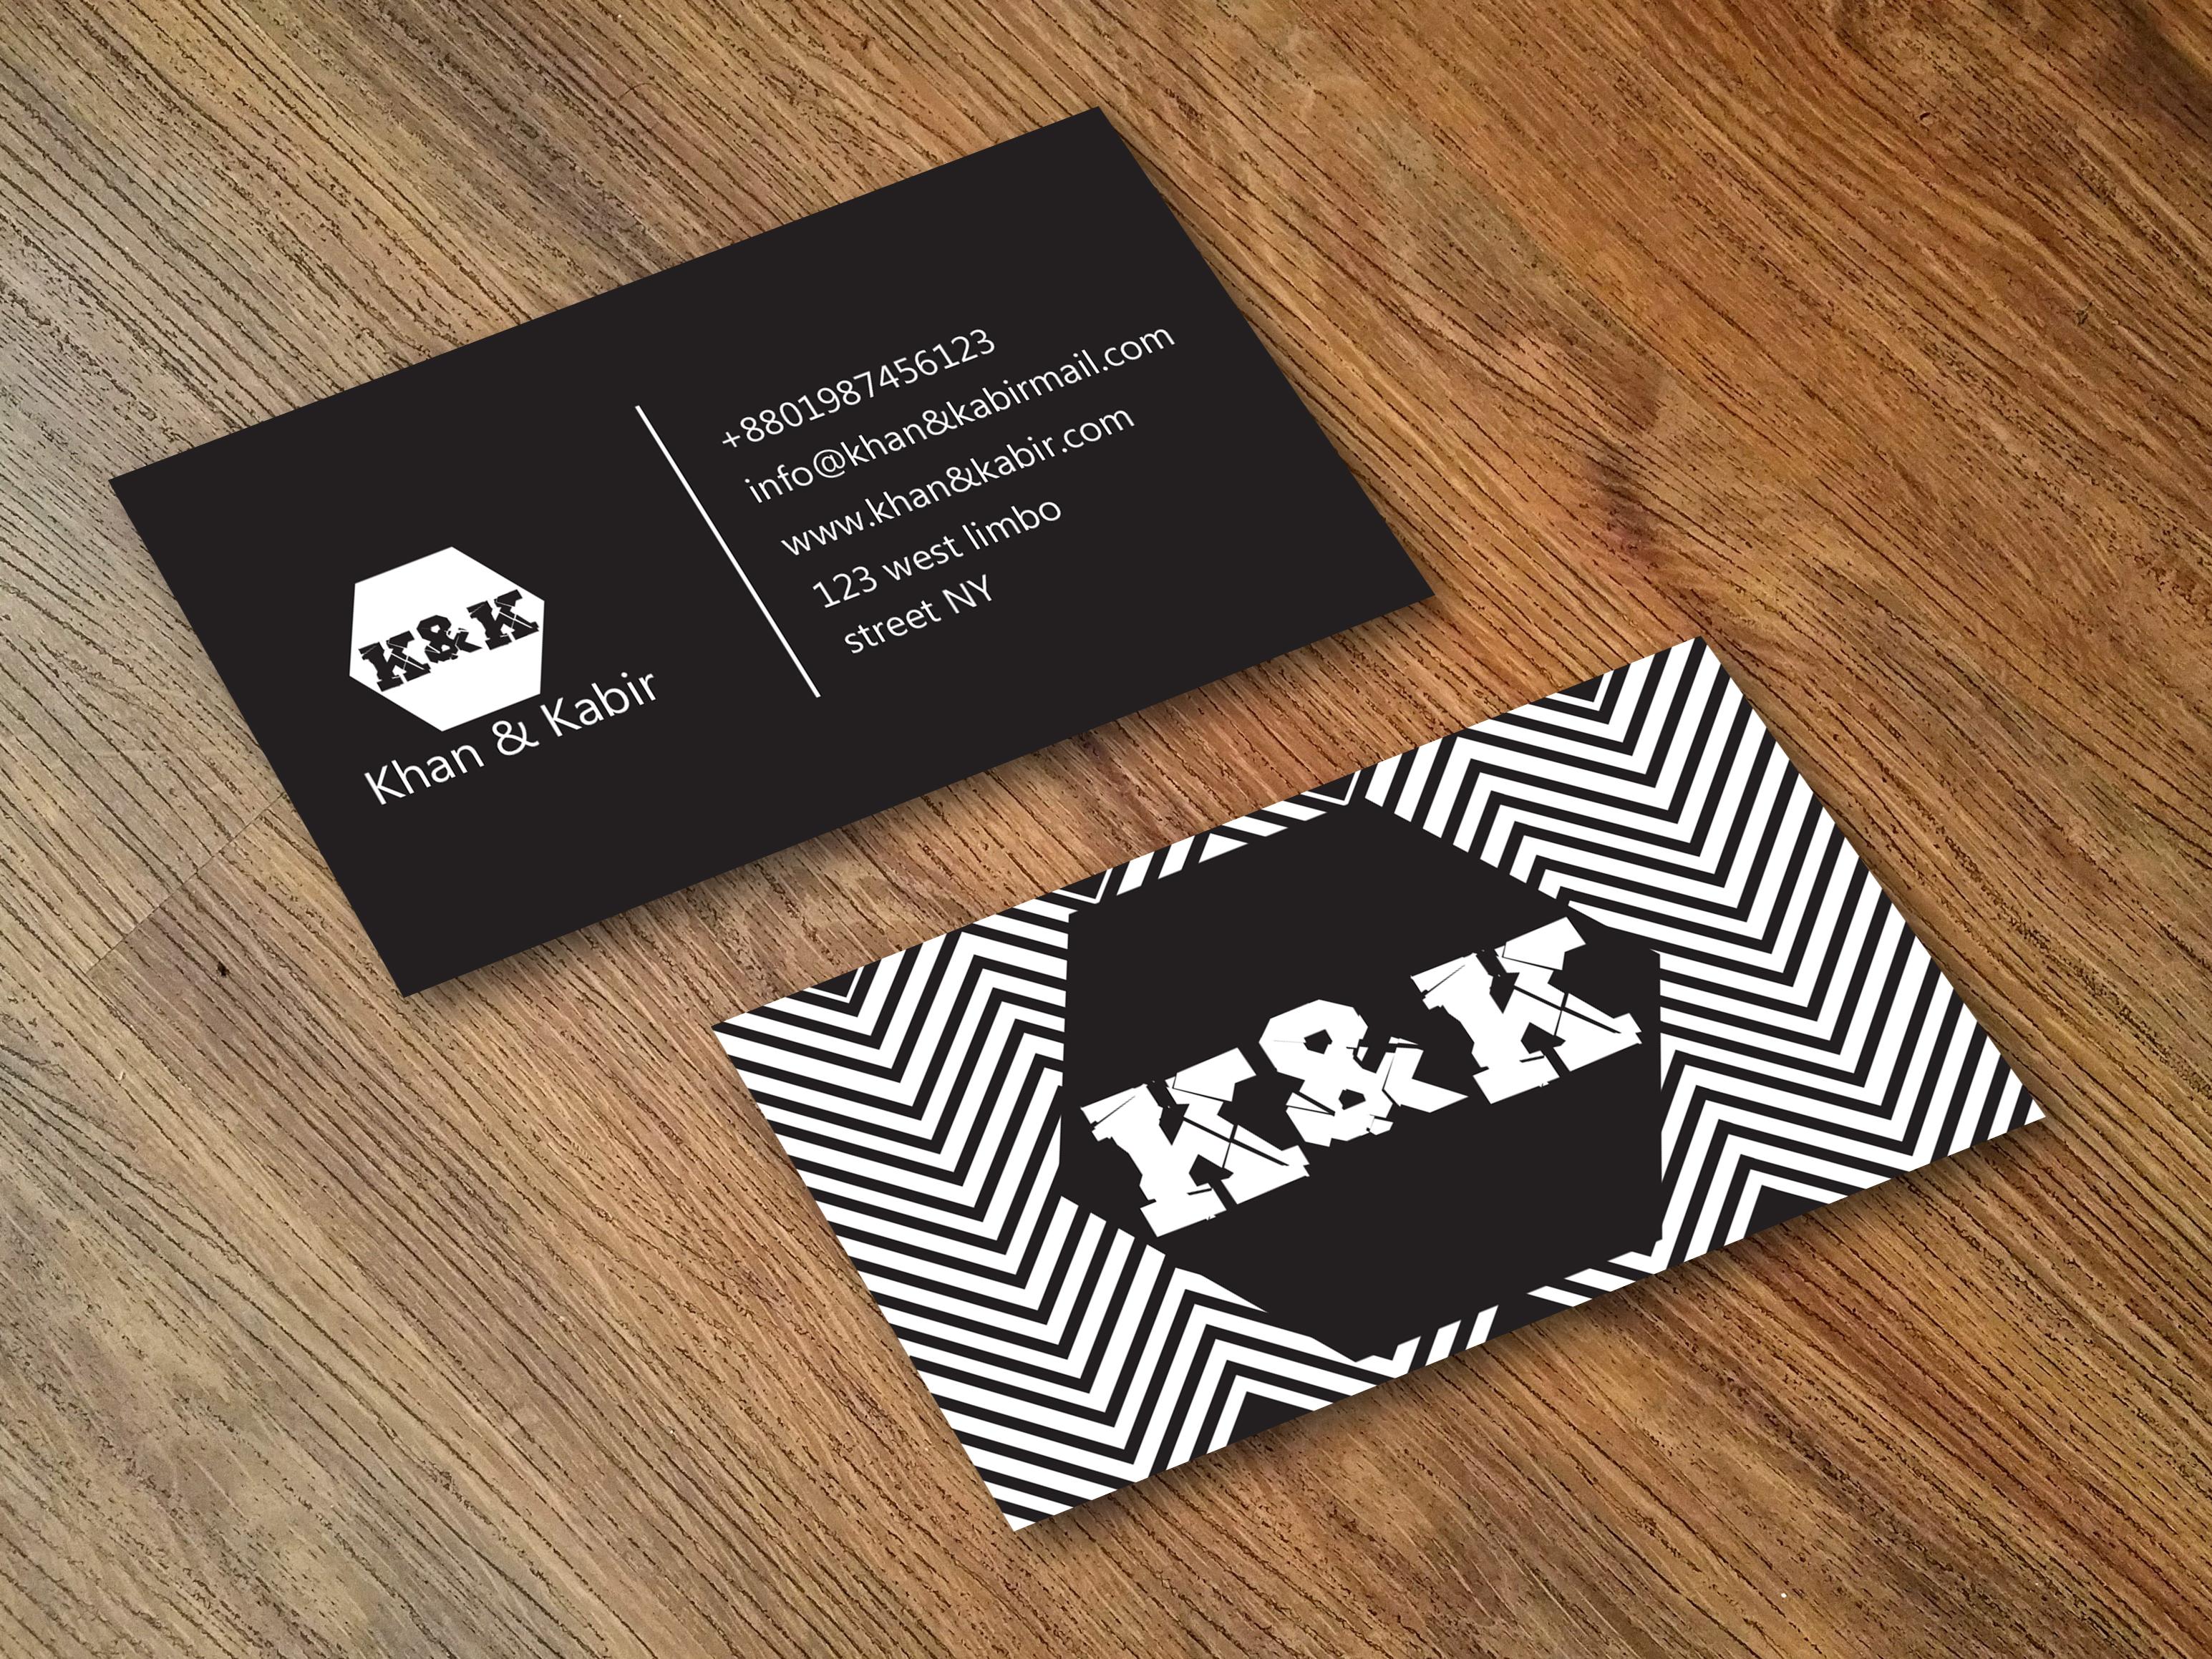 I wil make creative business card, Gold foil, Moo design